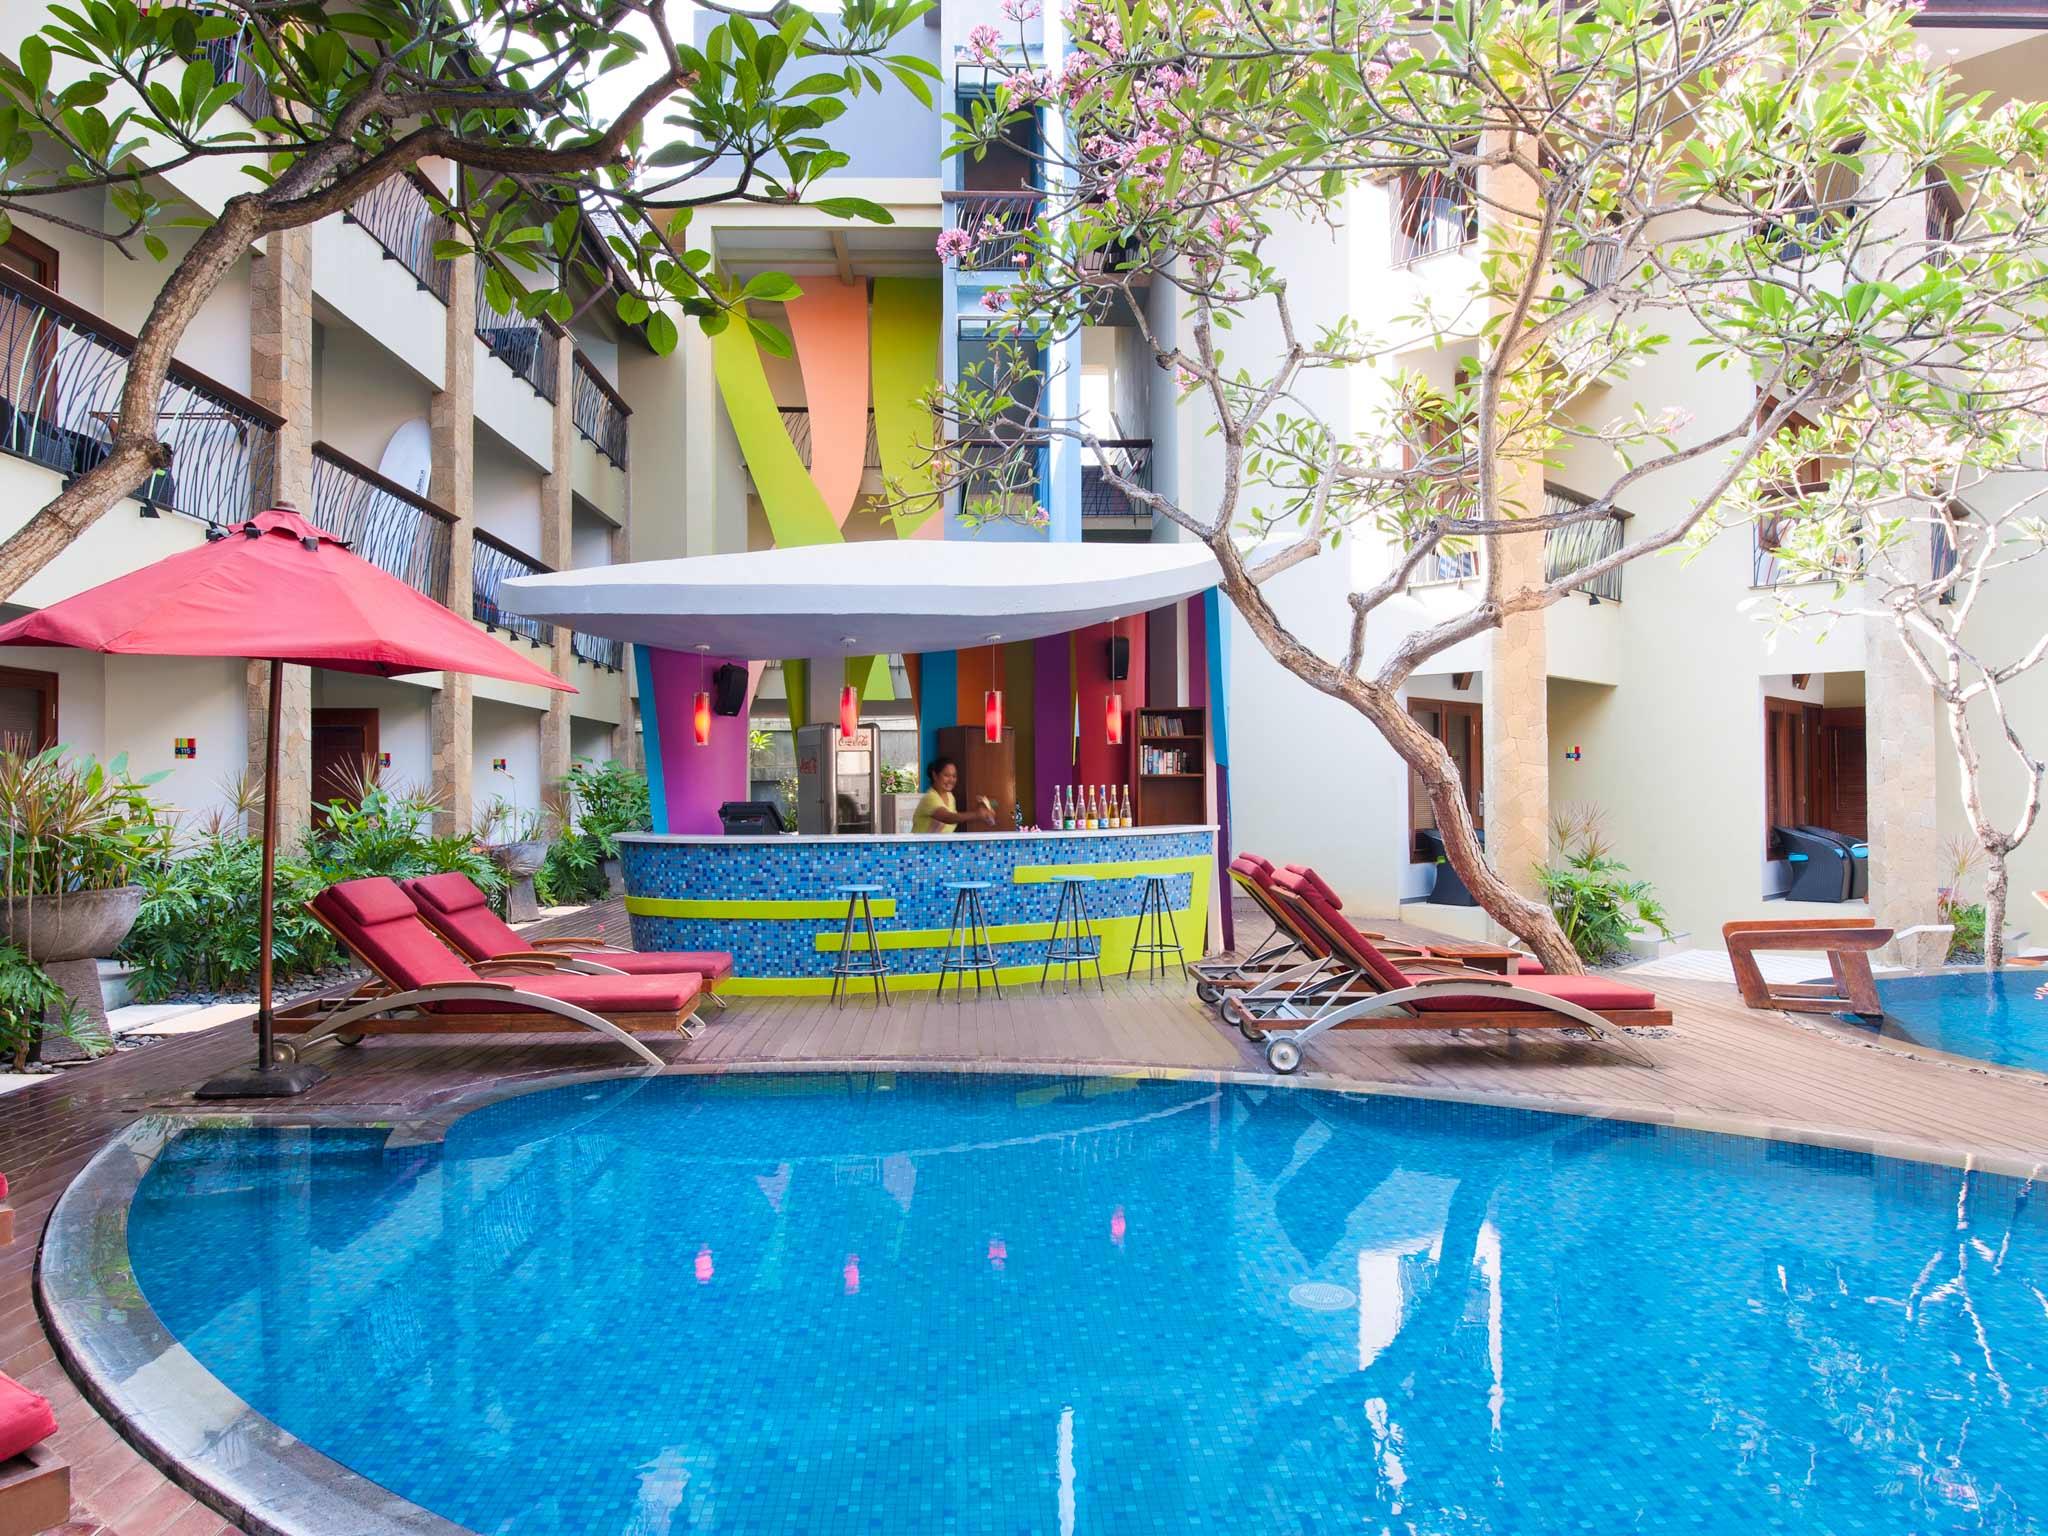 Hotel - all seasons Bali Legian (soon ibis Styles)